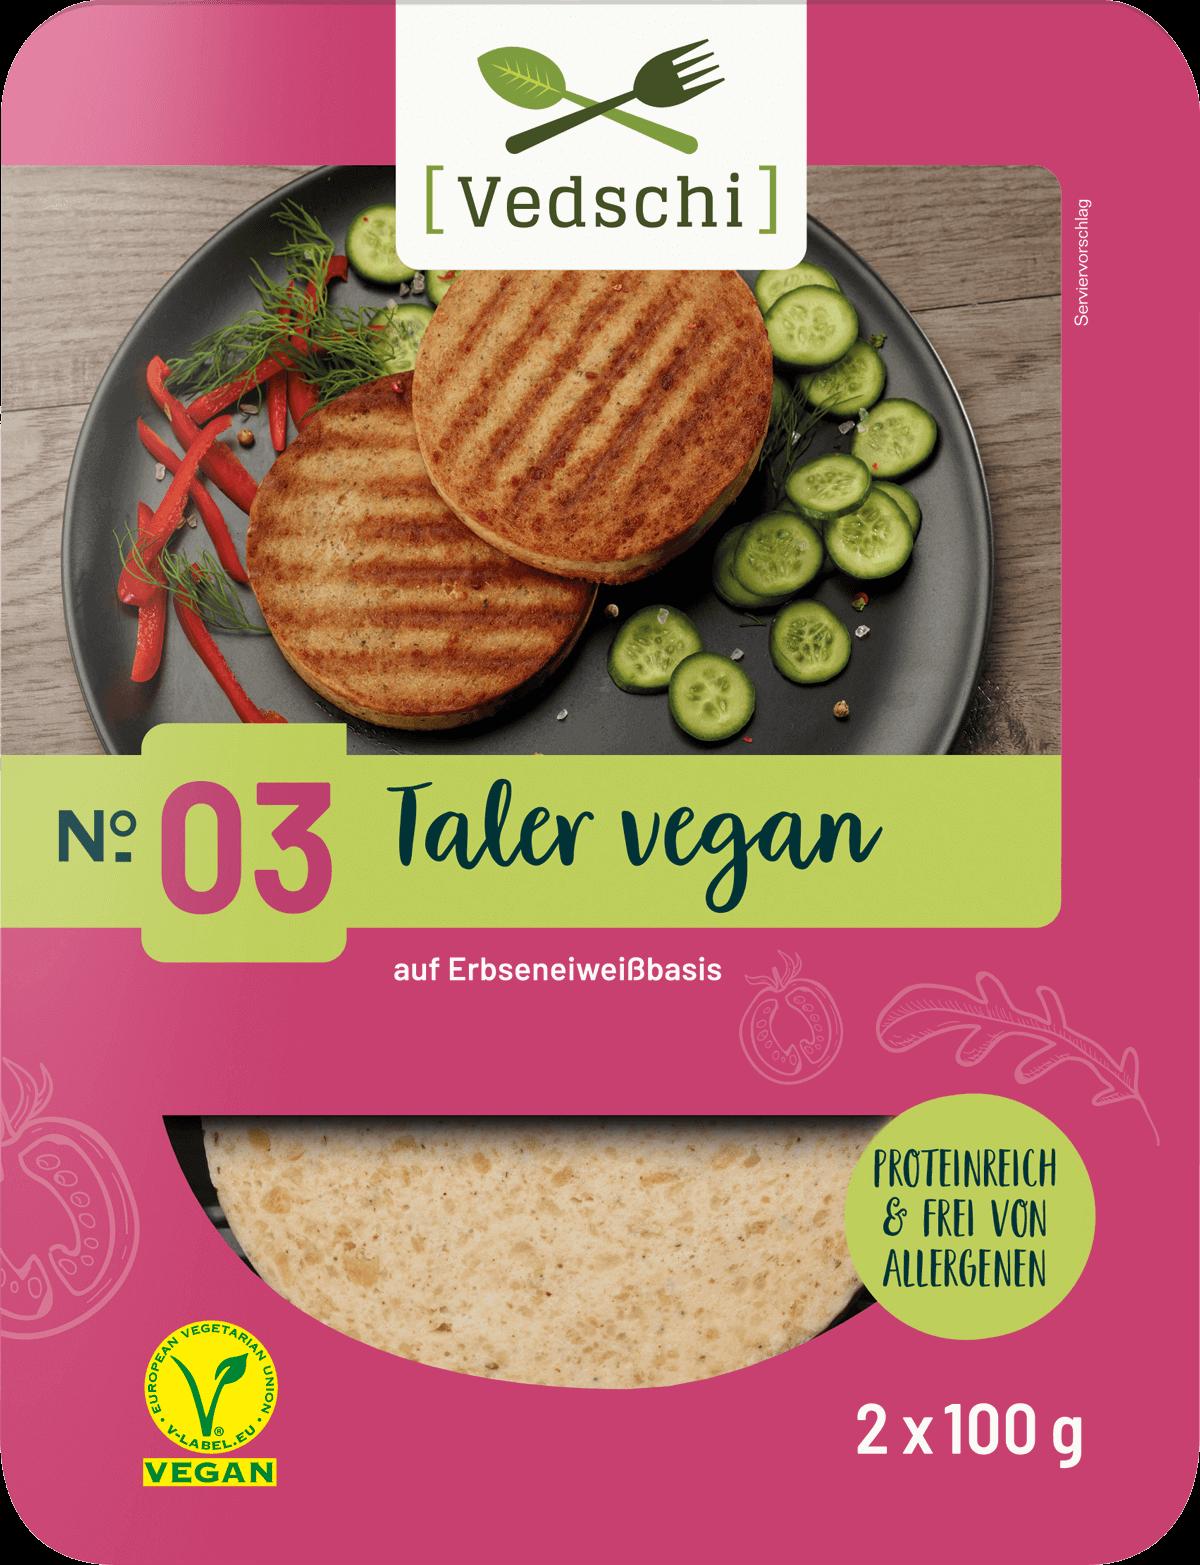 № 03 Taler vegan